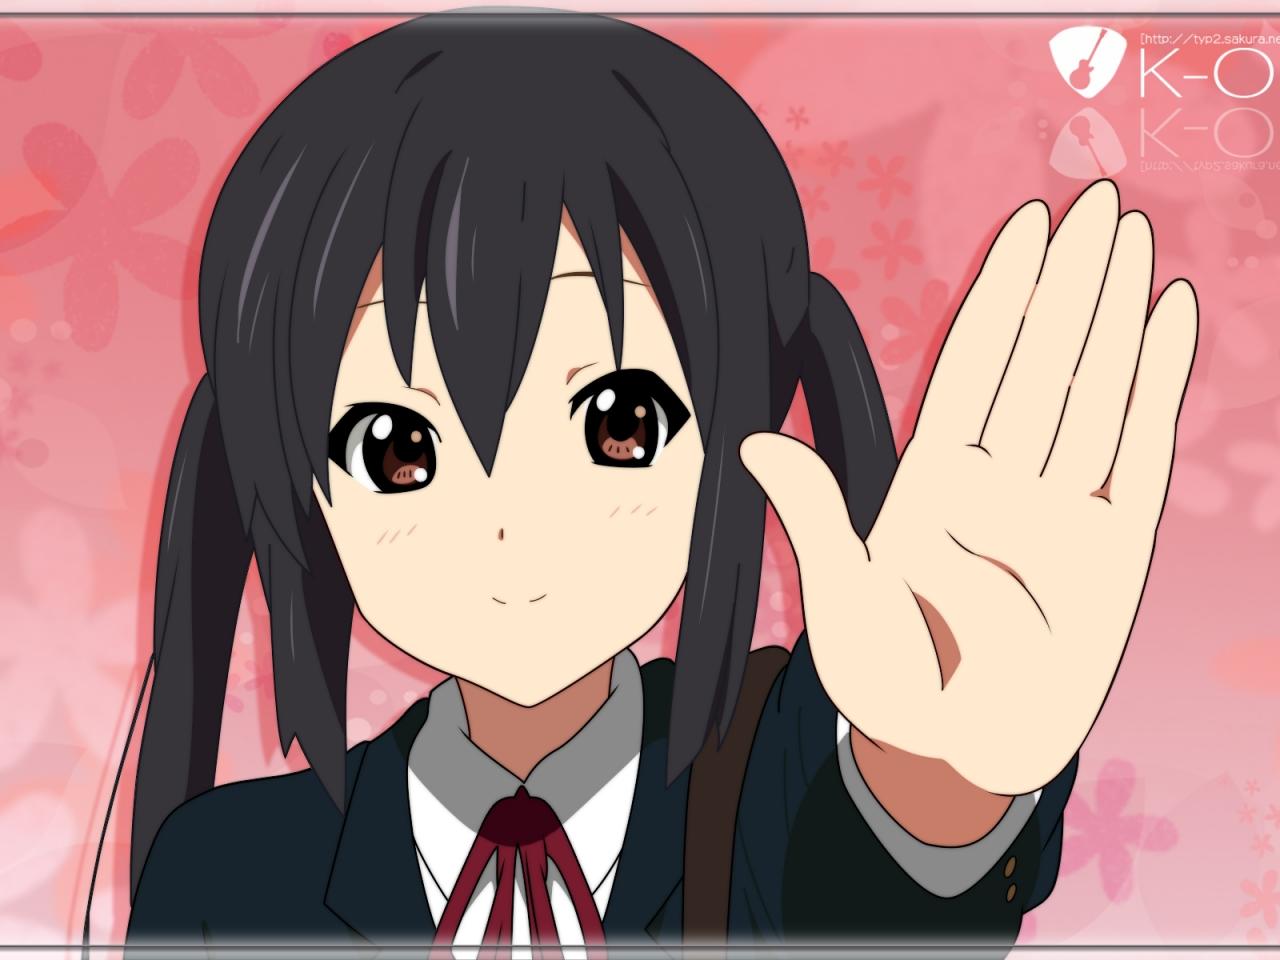 Una niña de animes - 1280x960